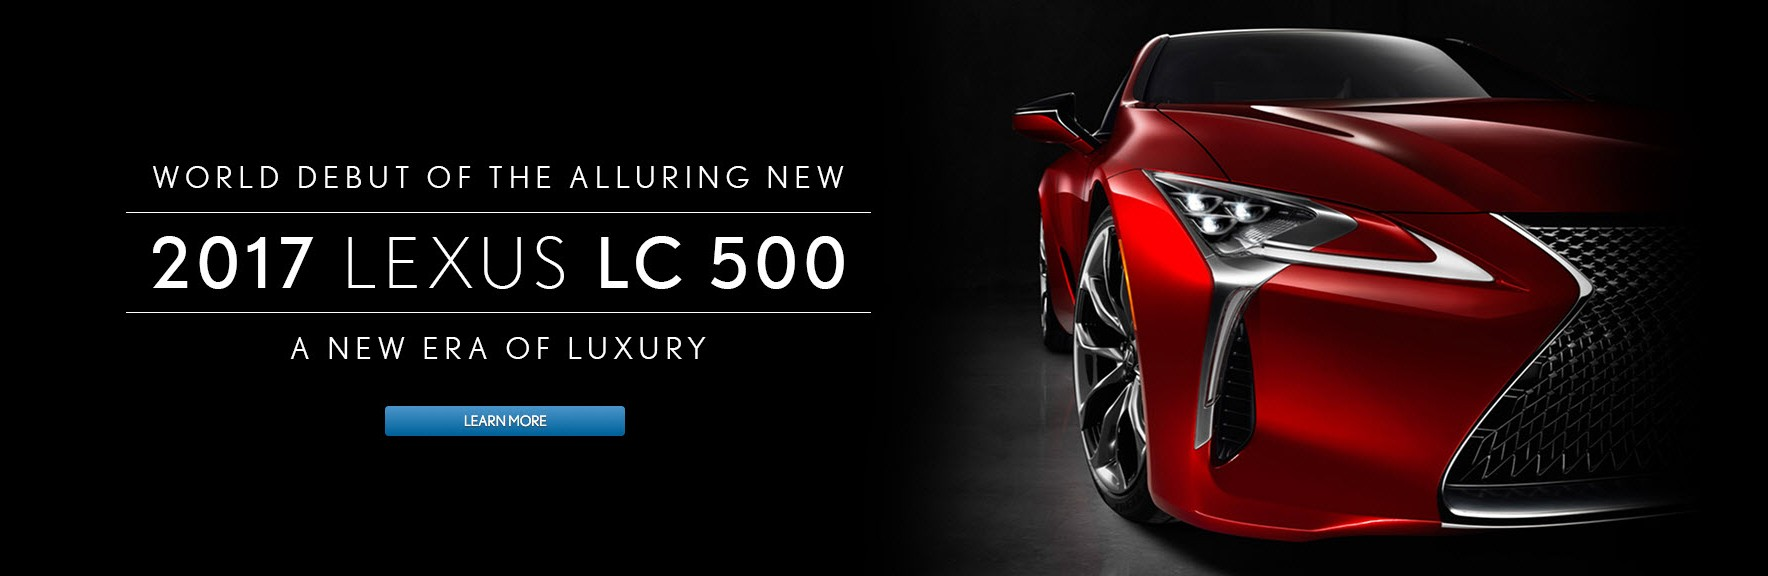 World debut of 2017 Lexus LC 500